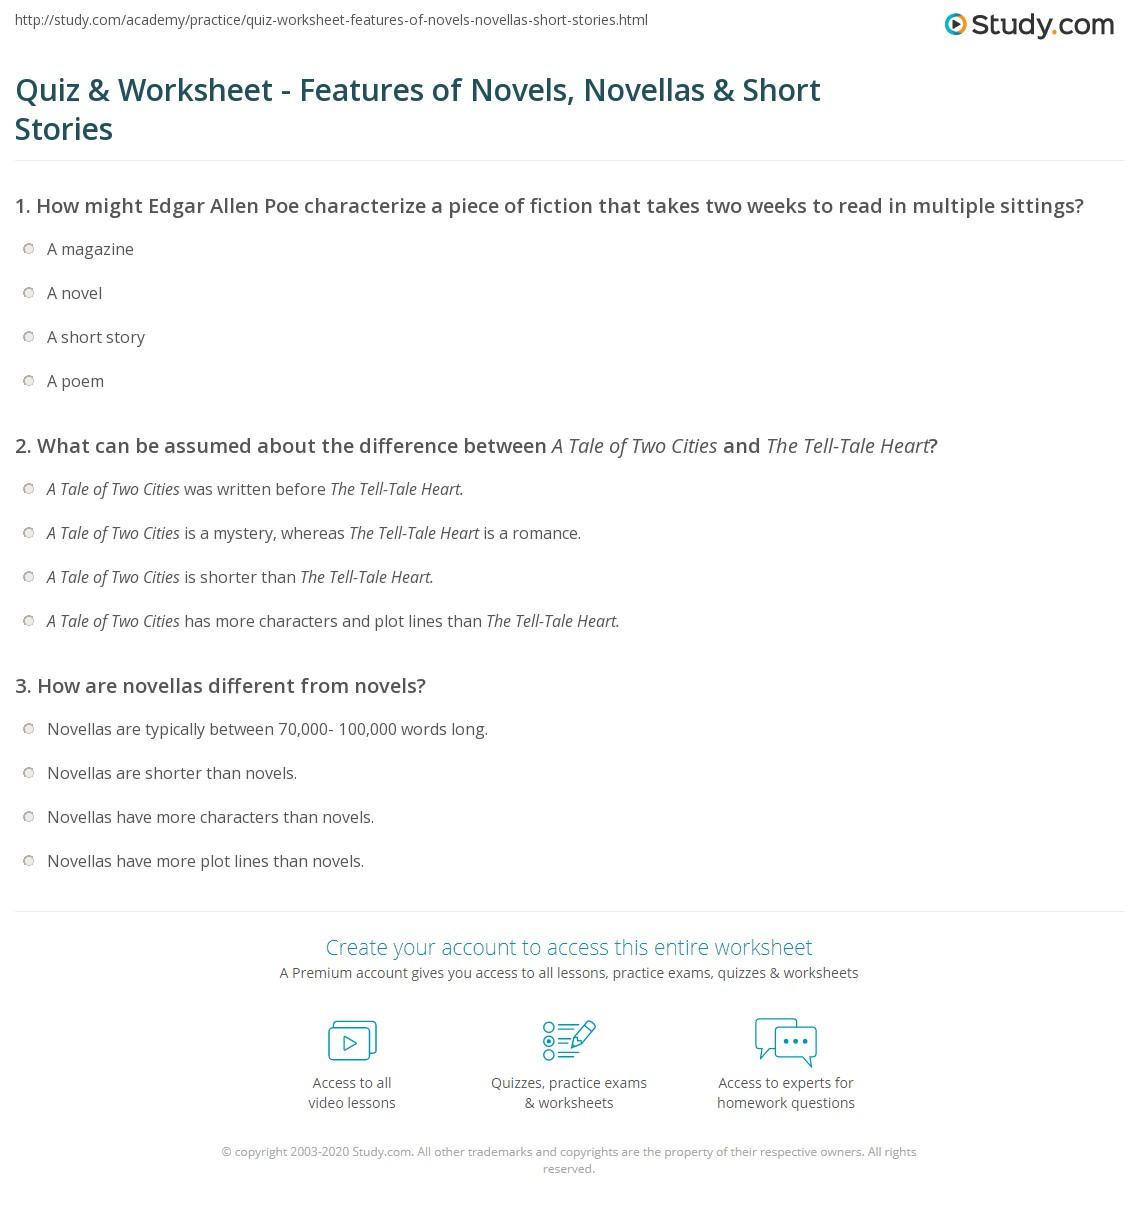 Quiz W Ksheet Fe Tures Of Novels Novell S Sh T St Ies